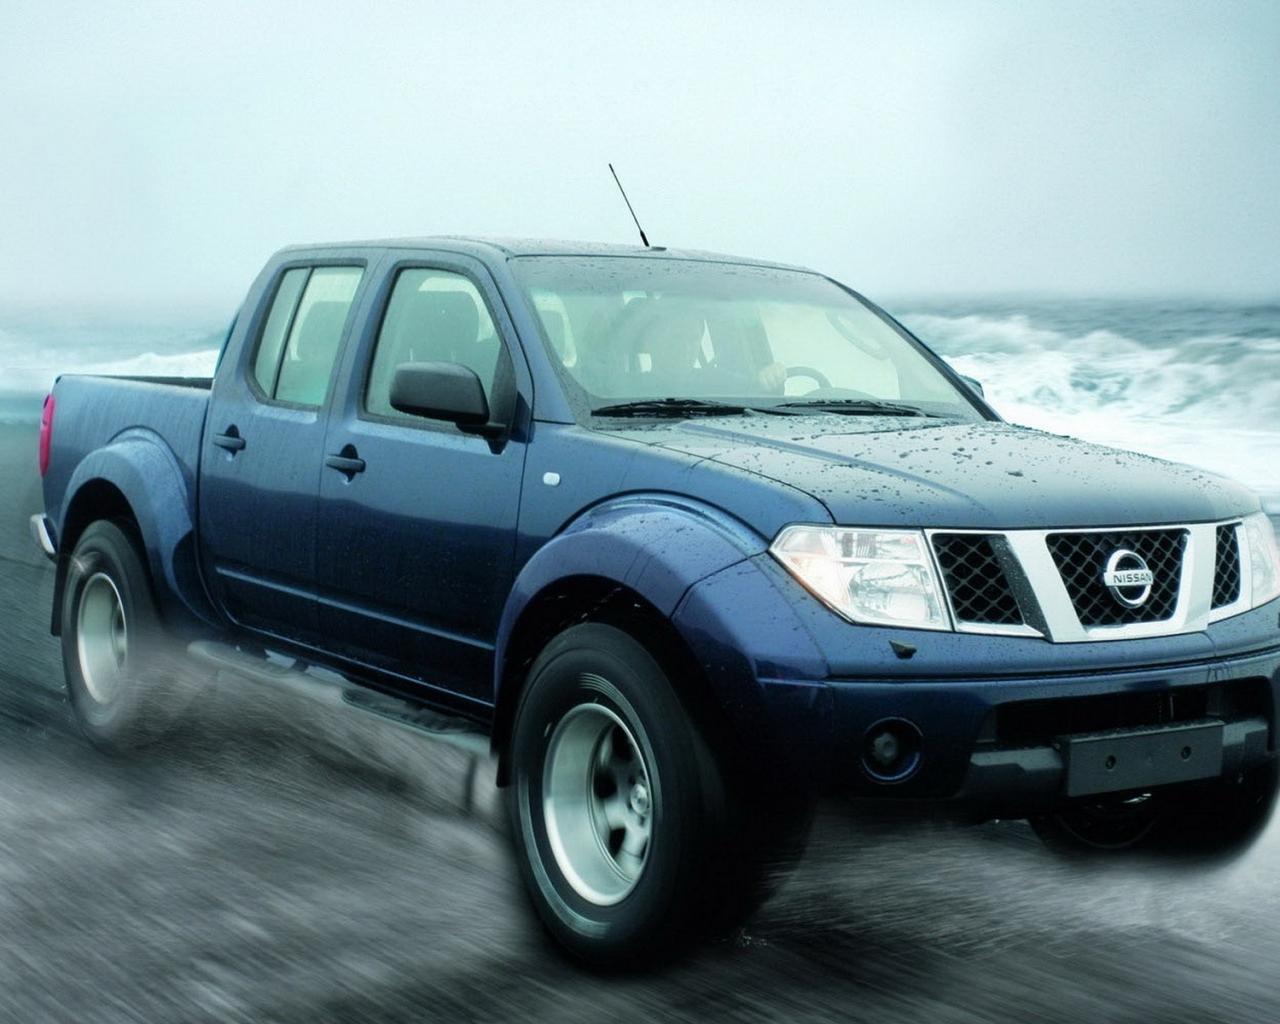 Pickup Nissan azul - 1280x1024